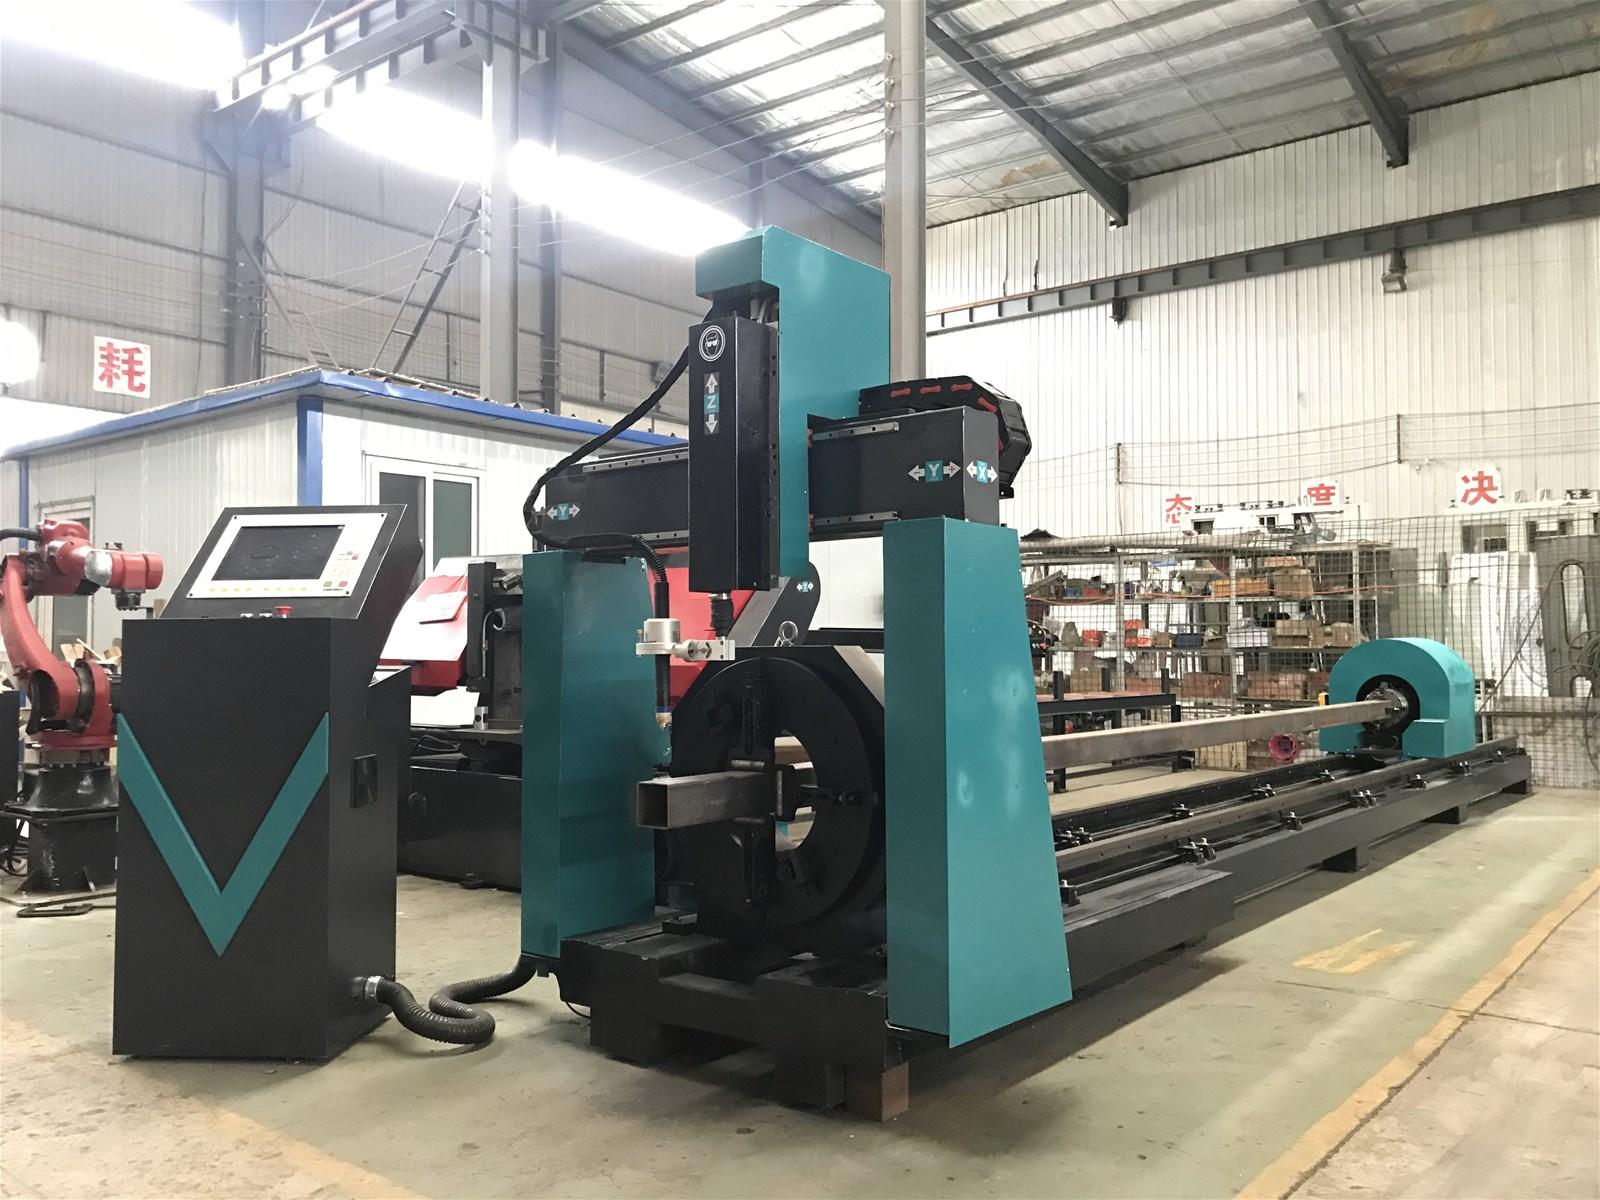 2021 hot sale 5 axis square pipe round tube cutting plasma cutting machine